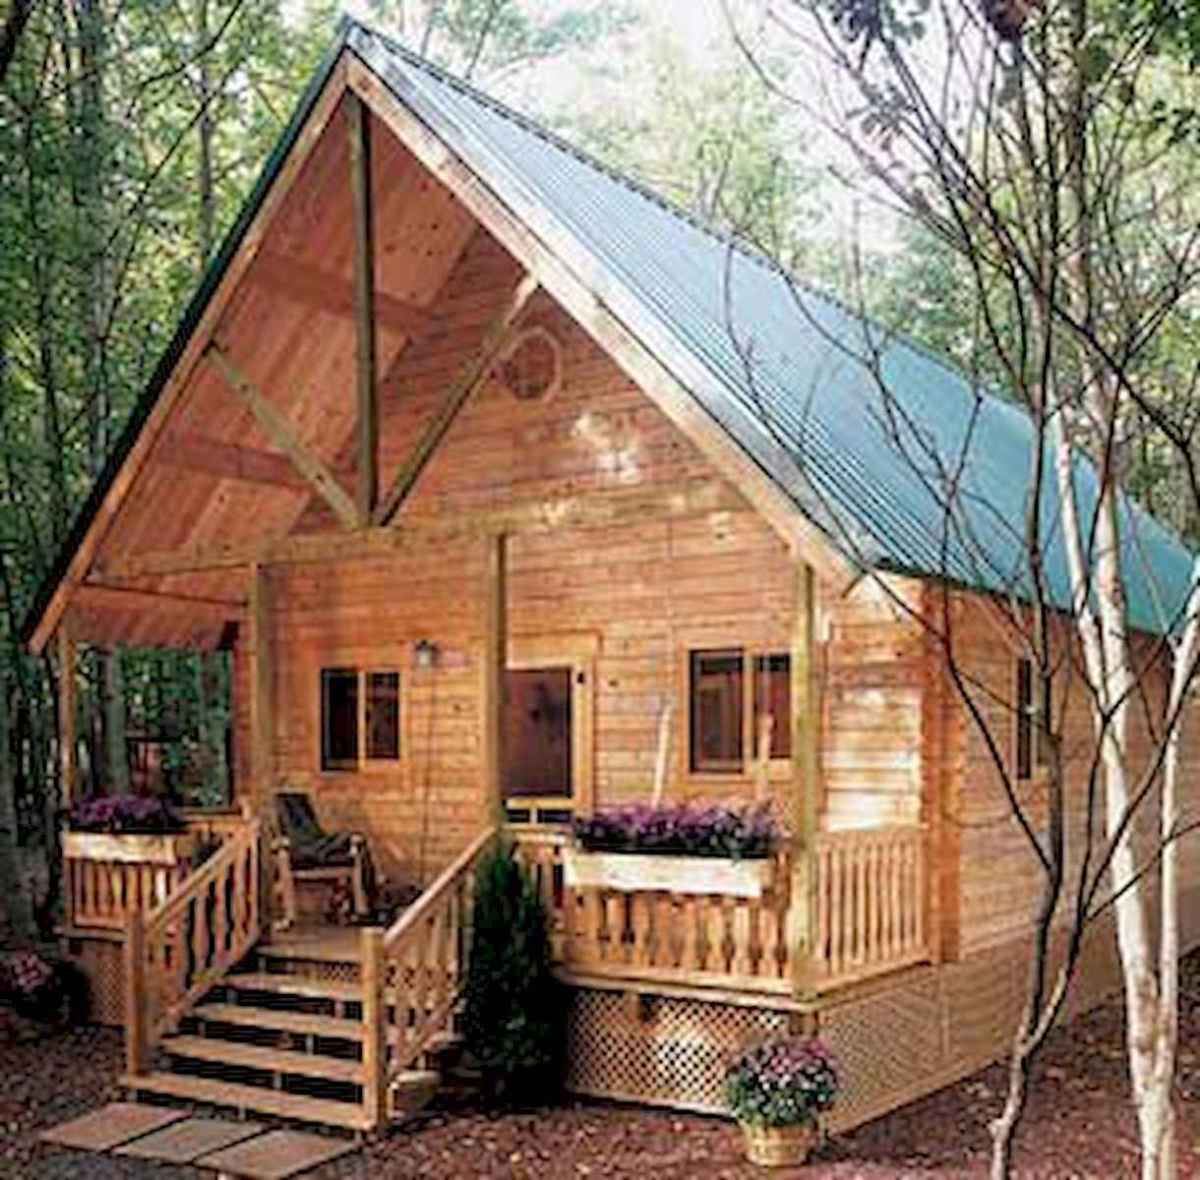 70 Suprising Small Log Cabin Homes Design Ideas (18)